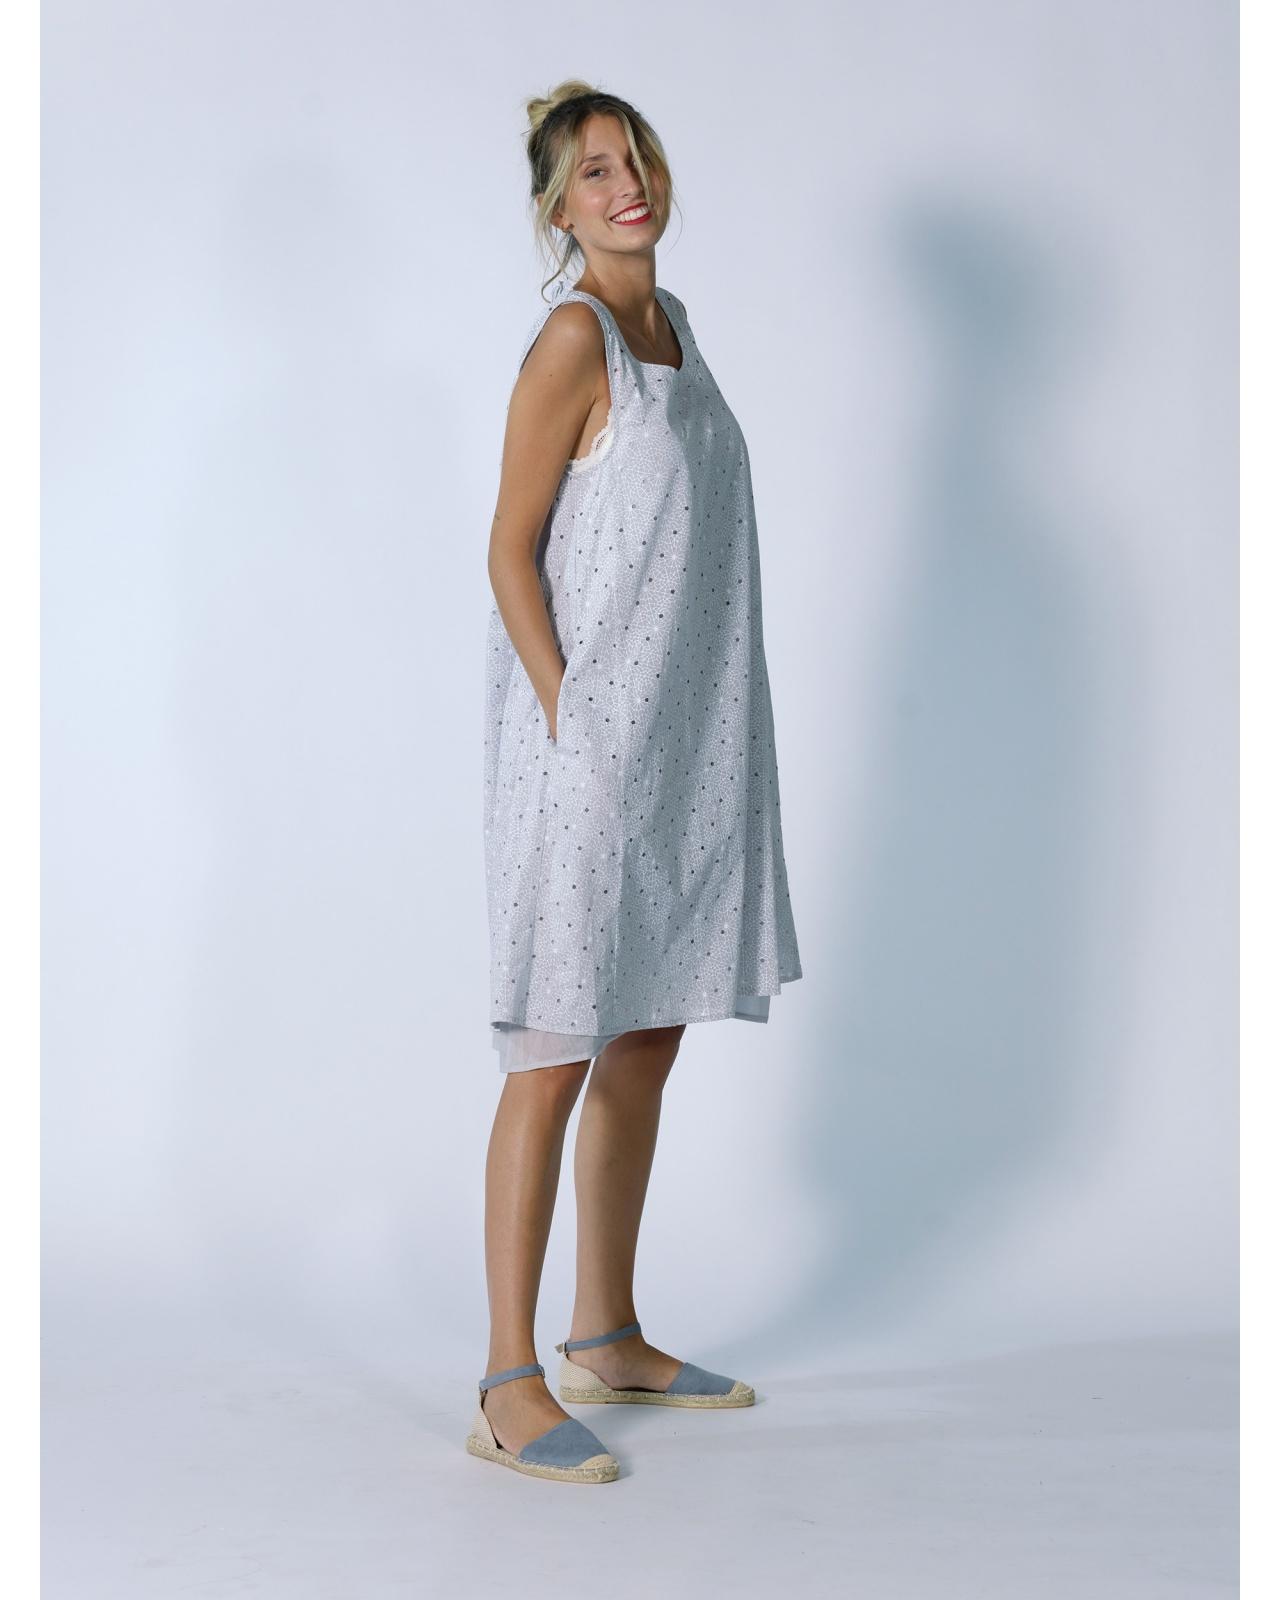 SHORT DRESS MISTRAL N°70 GRAY